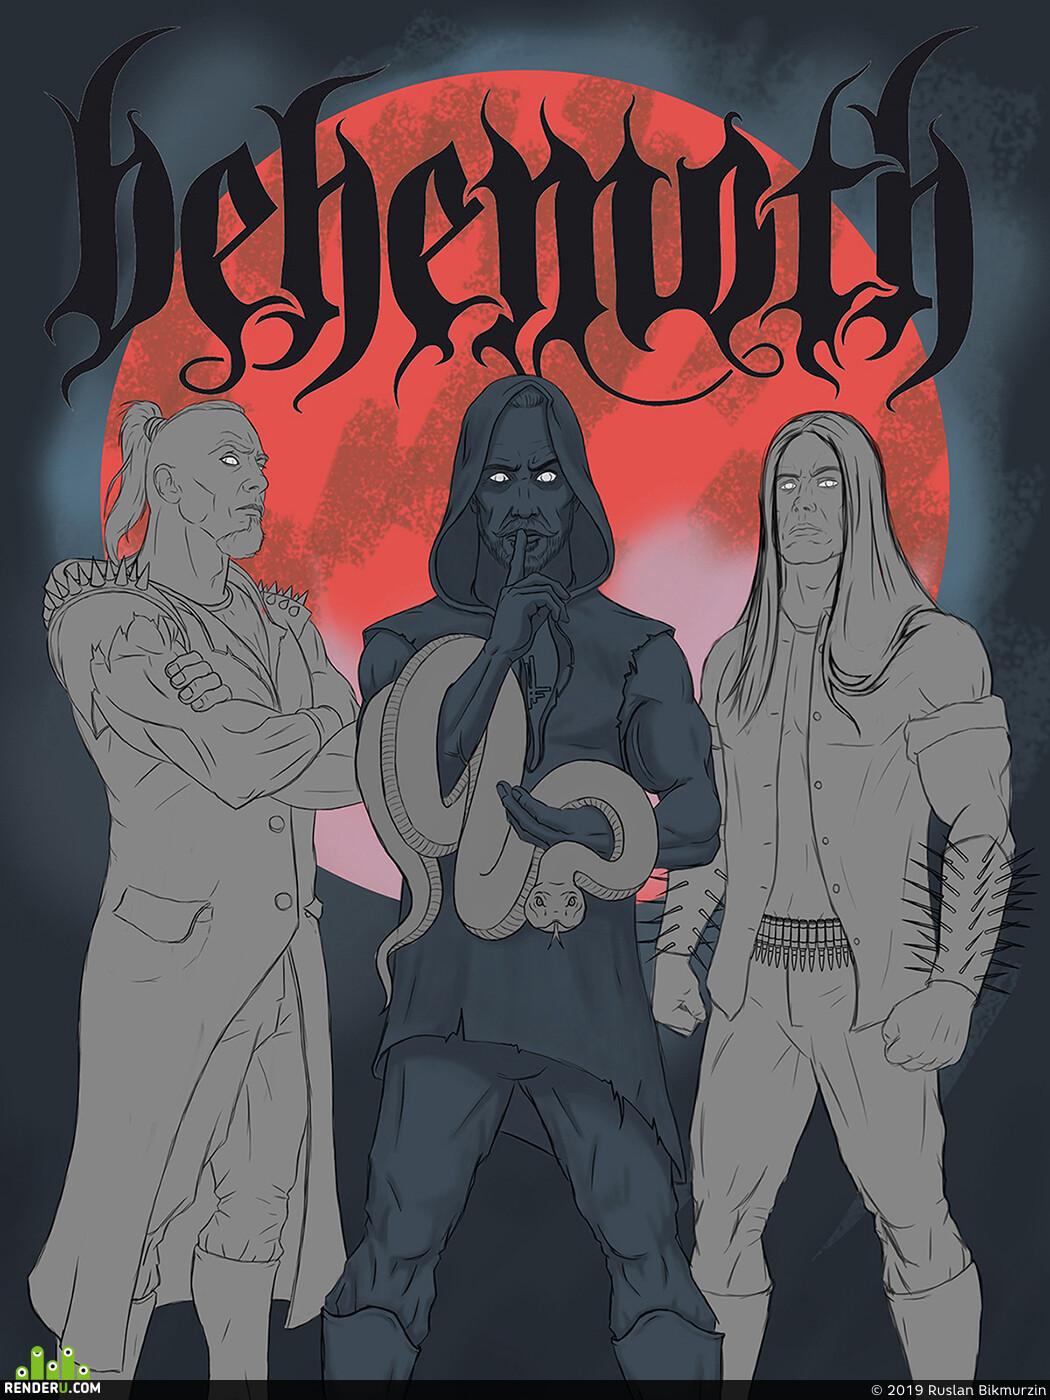 иллюсрация, персонаж, Тёмное фэнтези, иллюстрация, фентази, постер